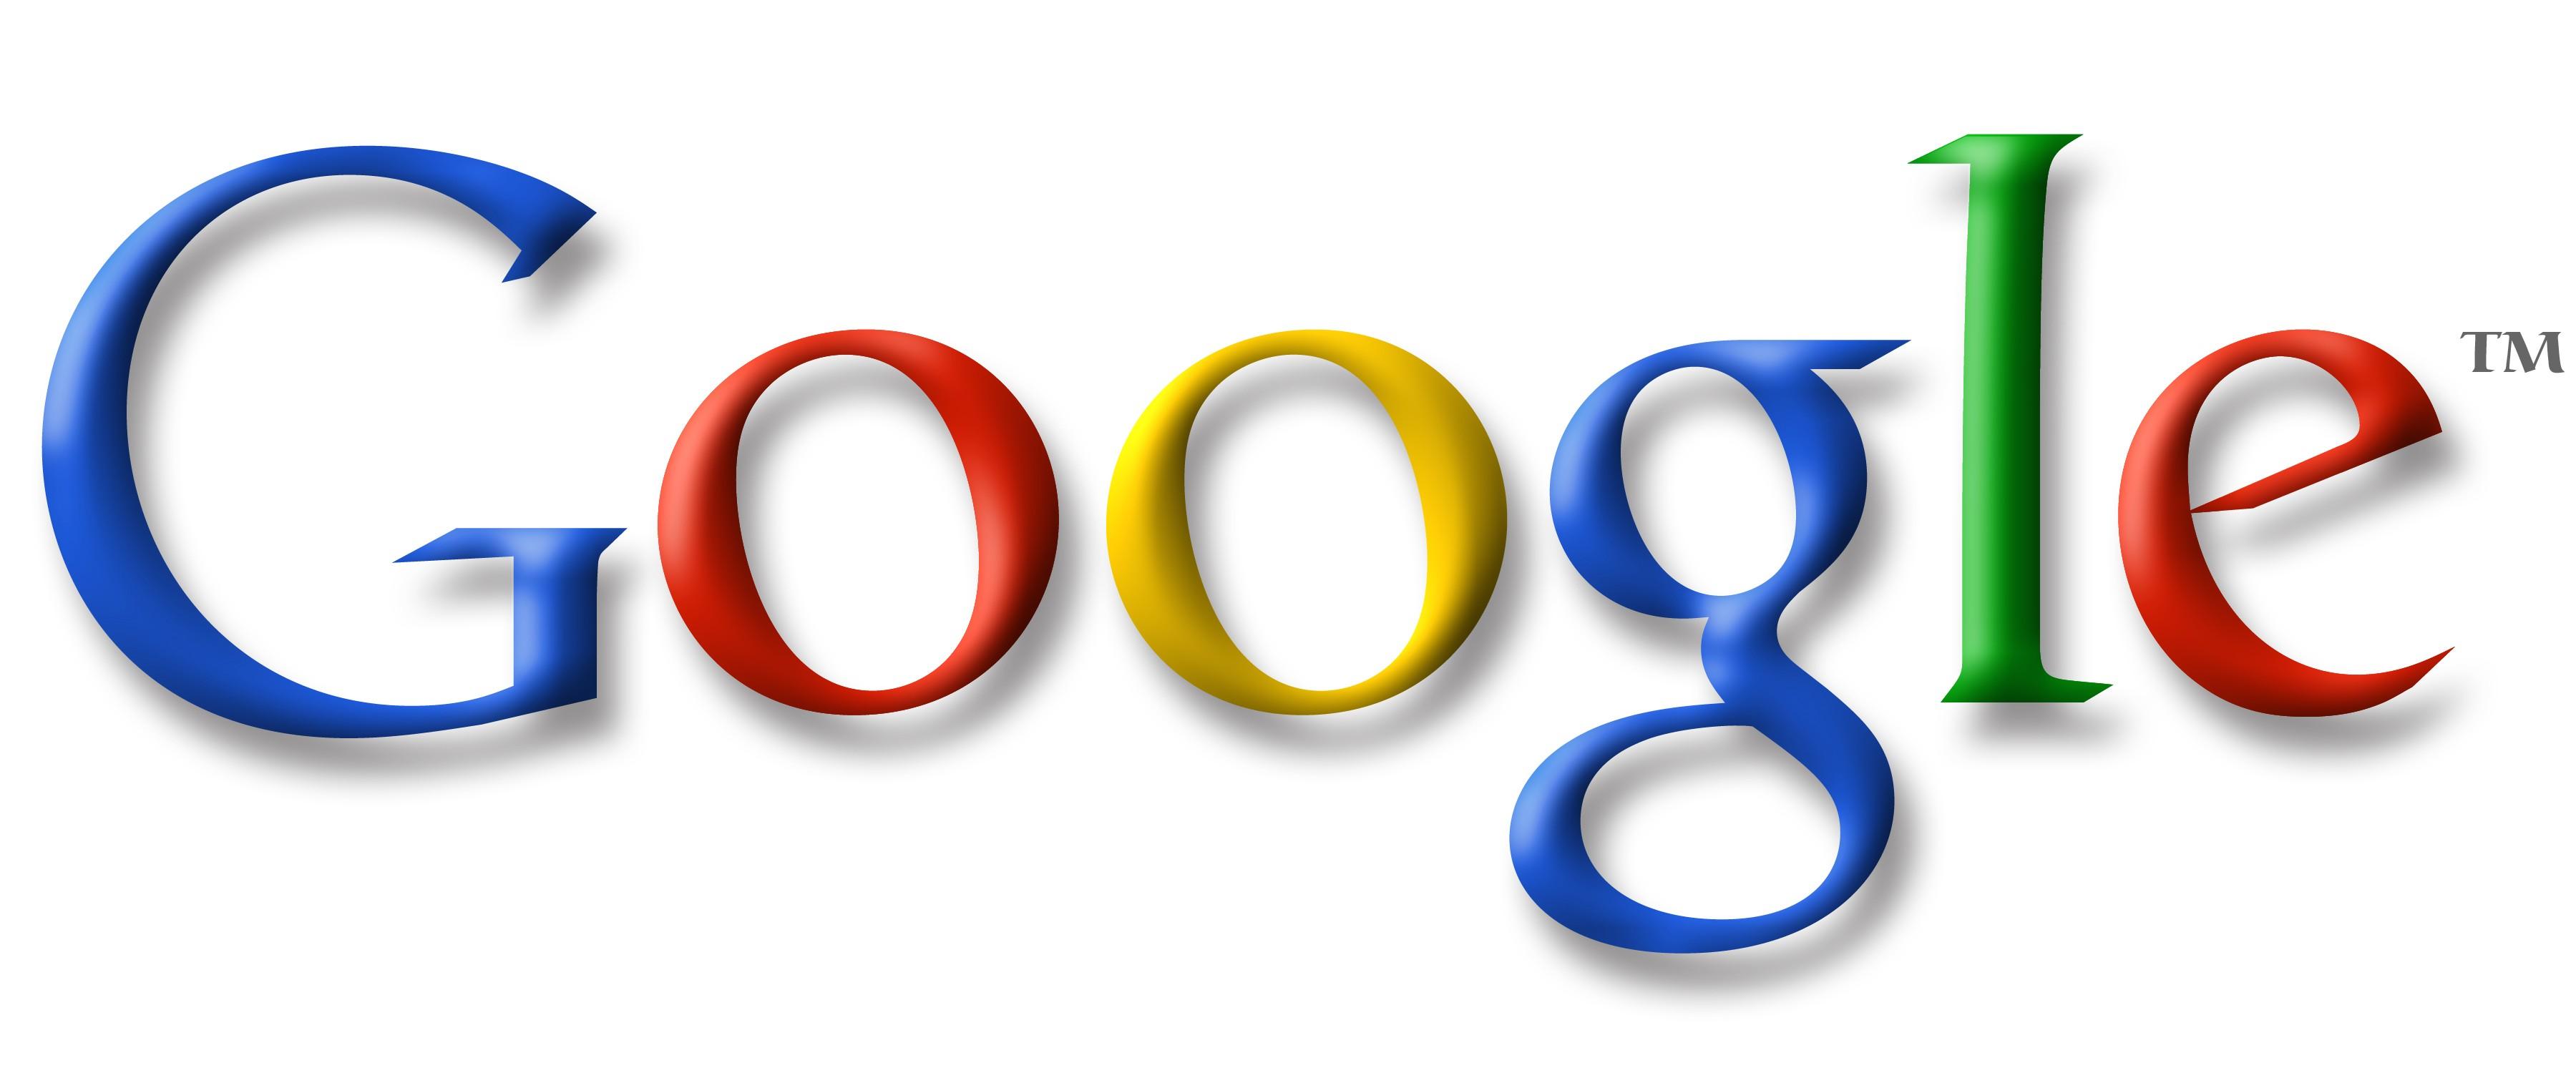 googletakeover